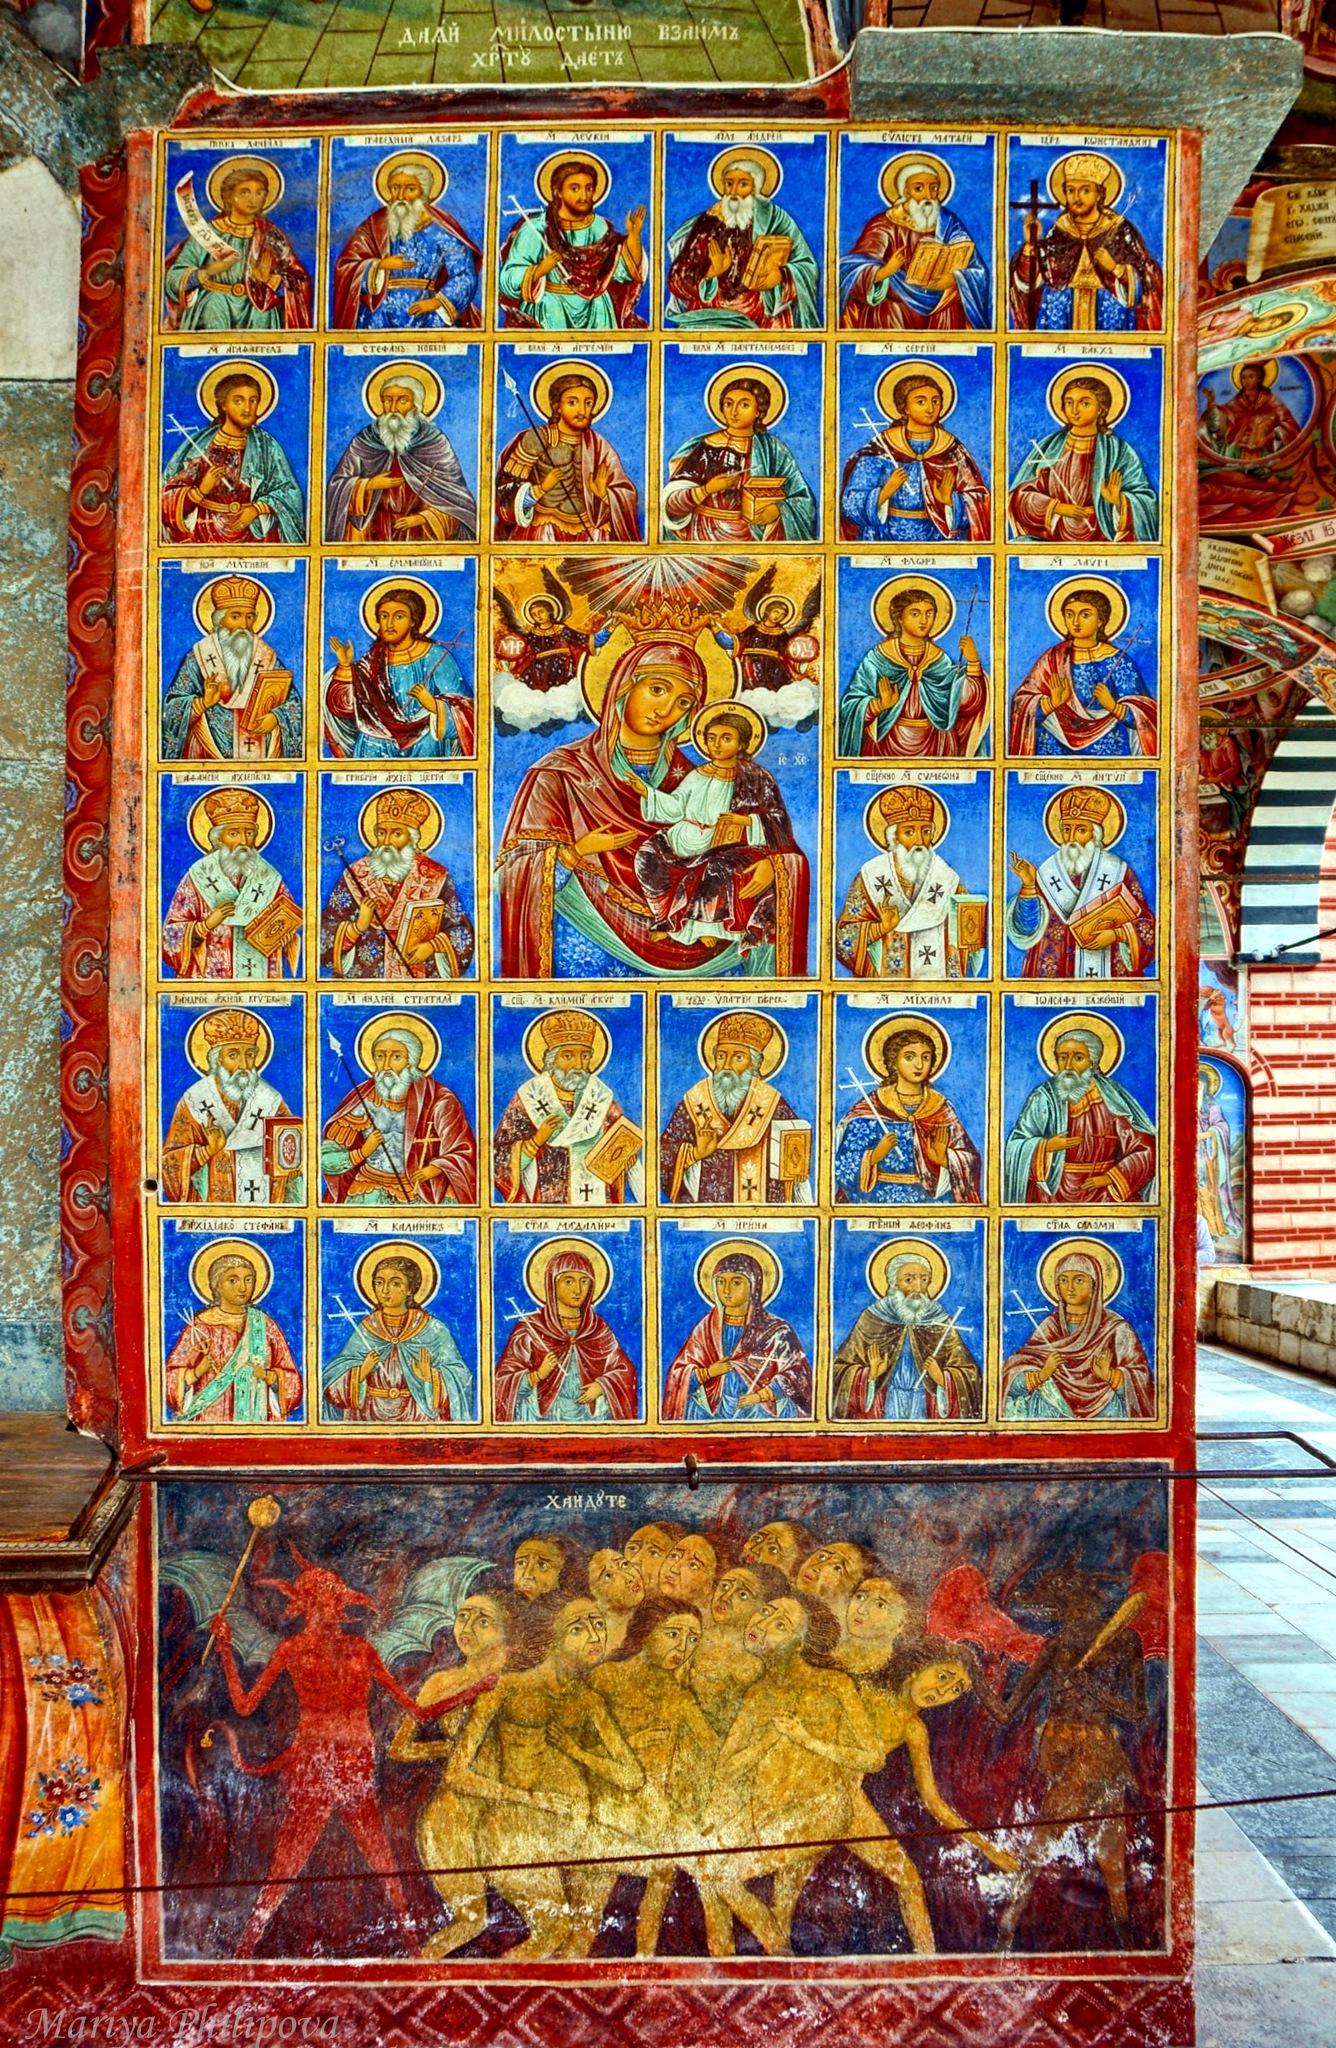 The main church of the Rila Monastery - mural by MariyaPhilipova